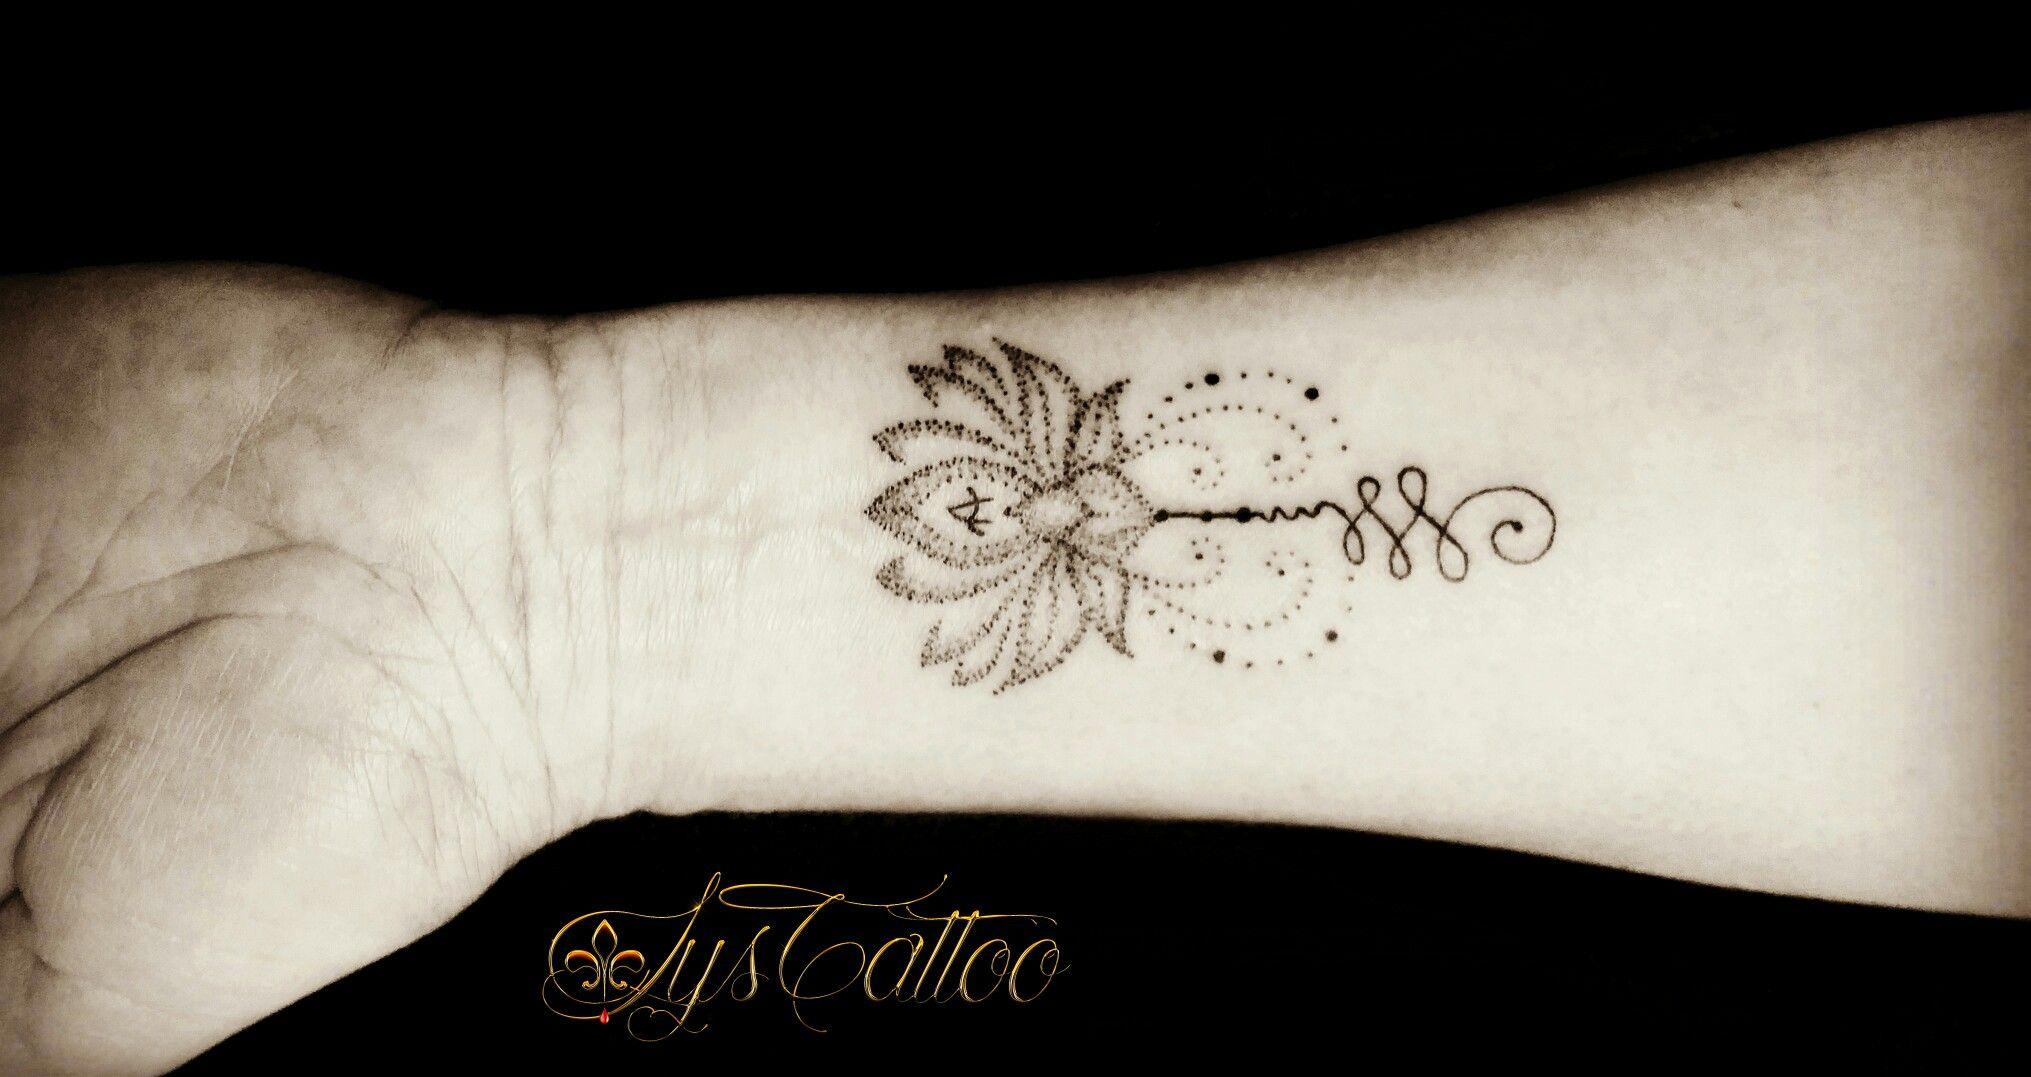 Calligraphie Tatouage Tatouage Prenom Poignet Tatouage Avant